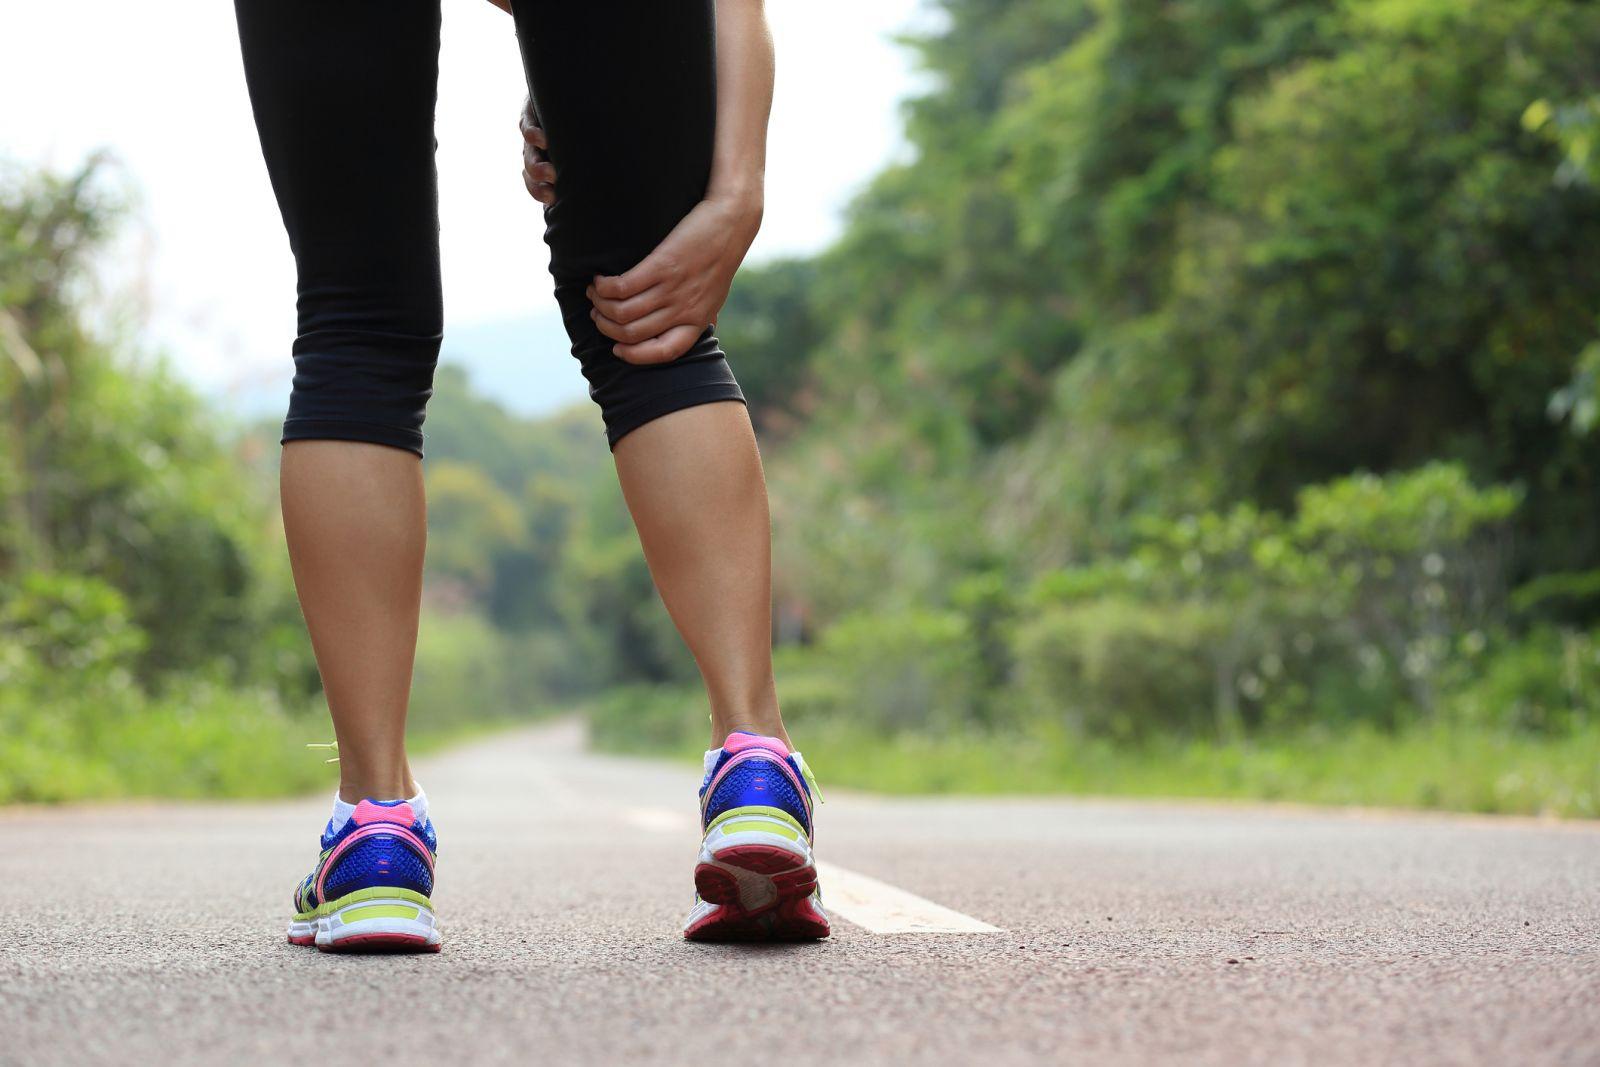 walking pain, legs hurt